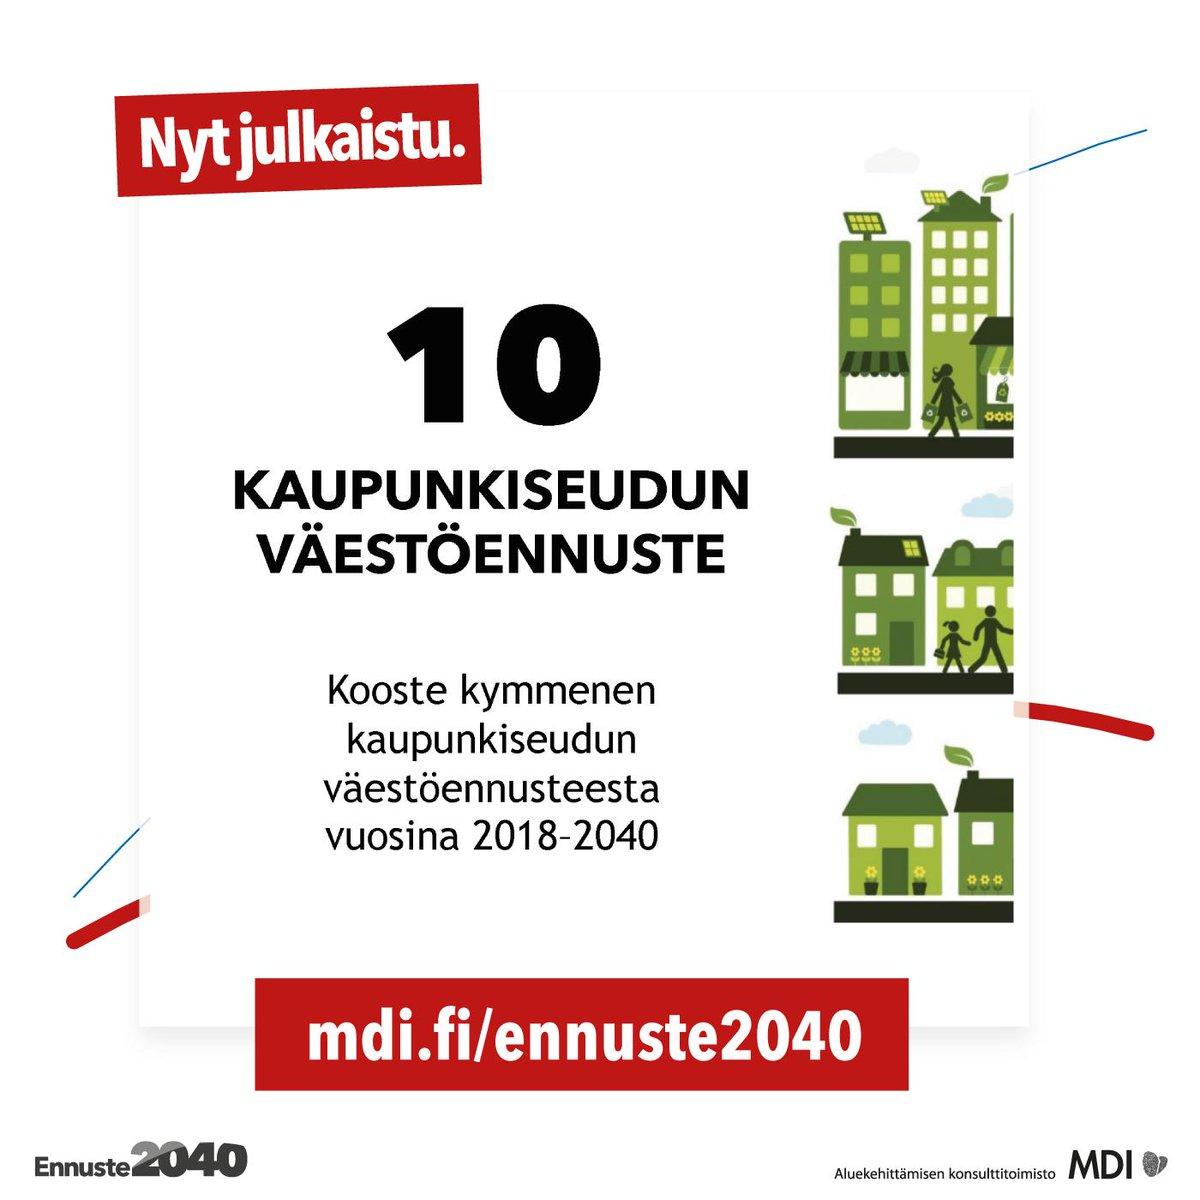 rakkaushoroskooppi me naiset norwegian kampanjakoodi